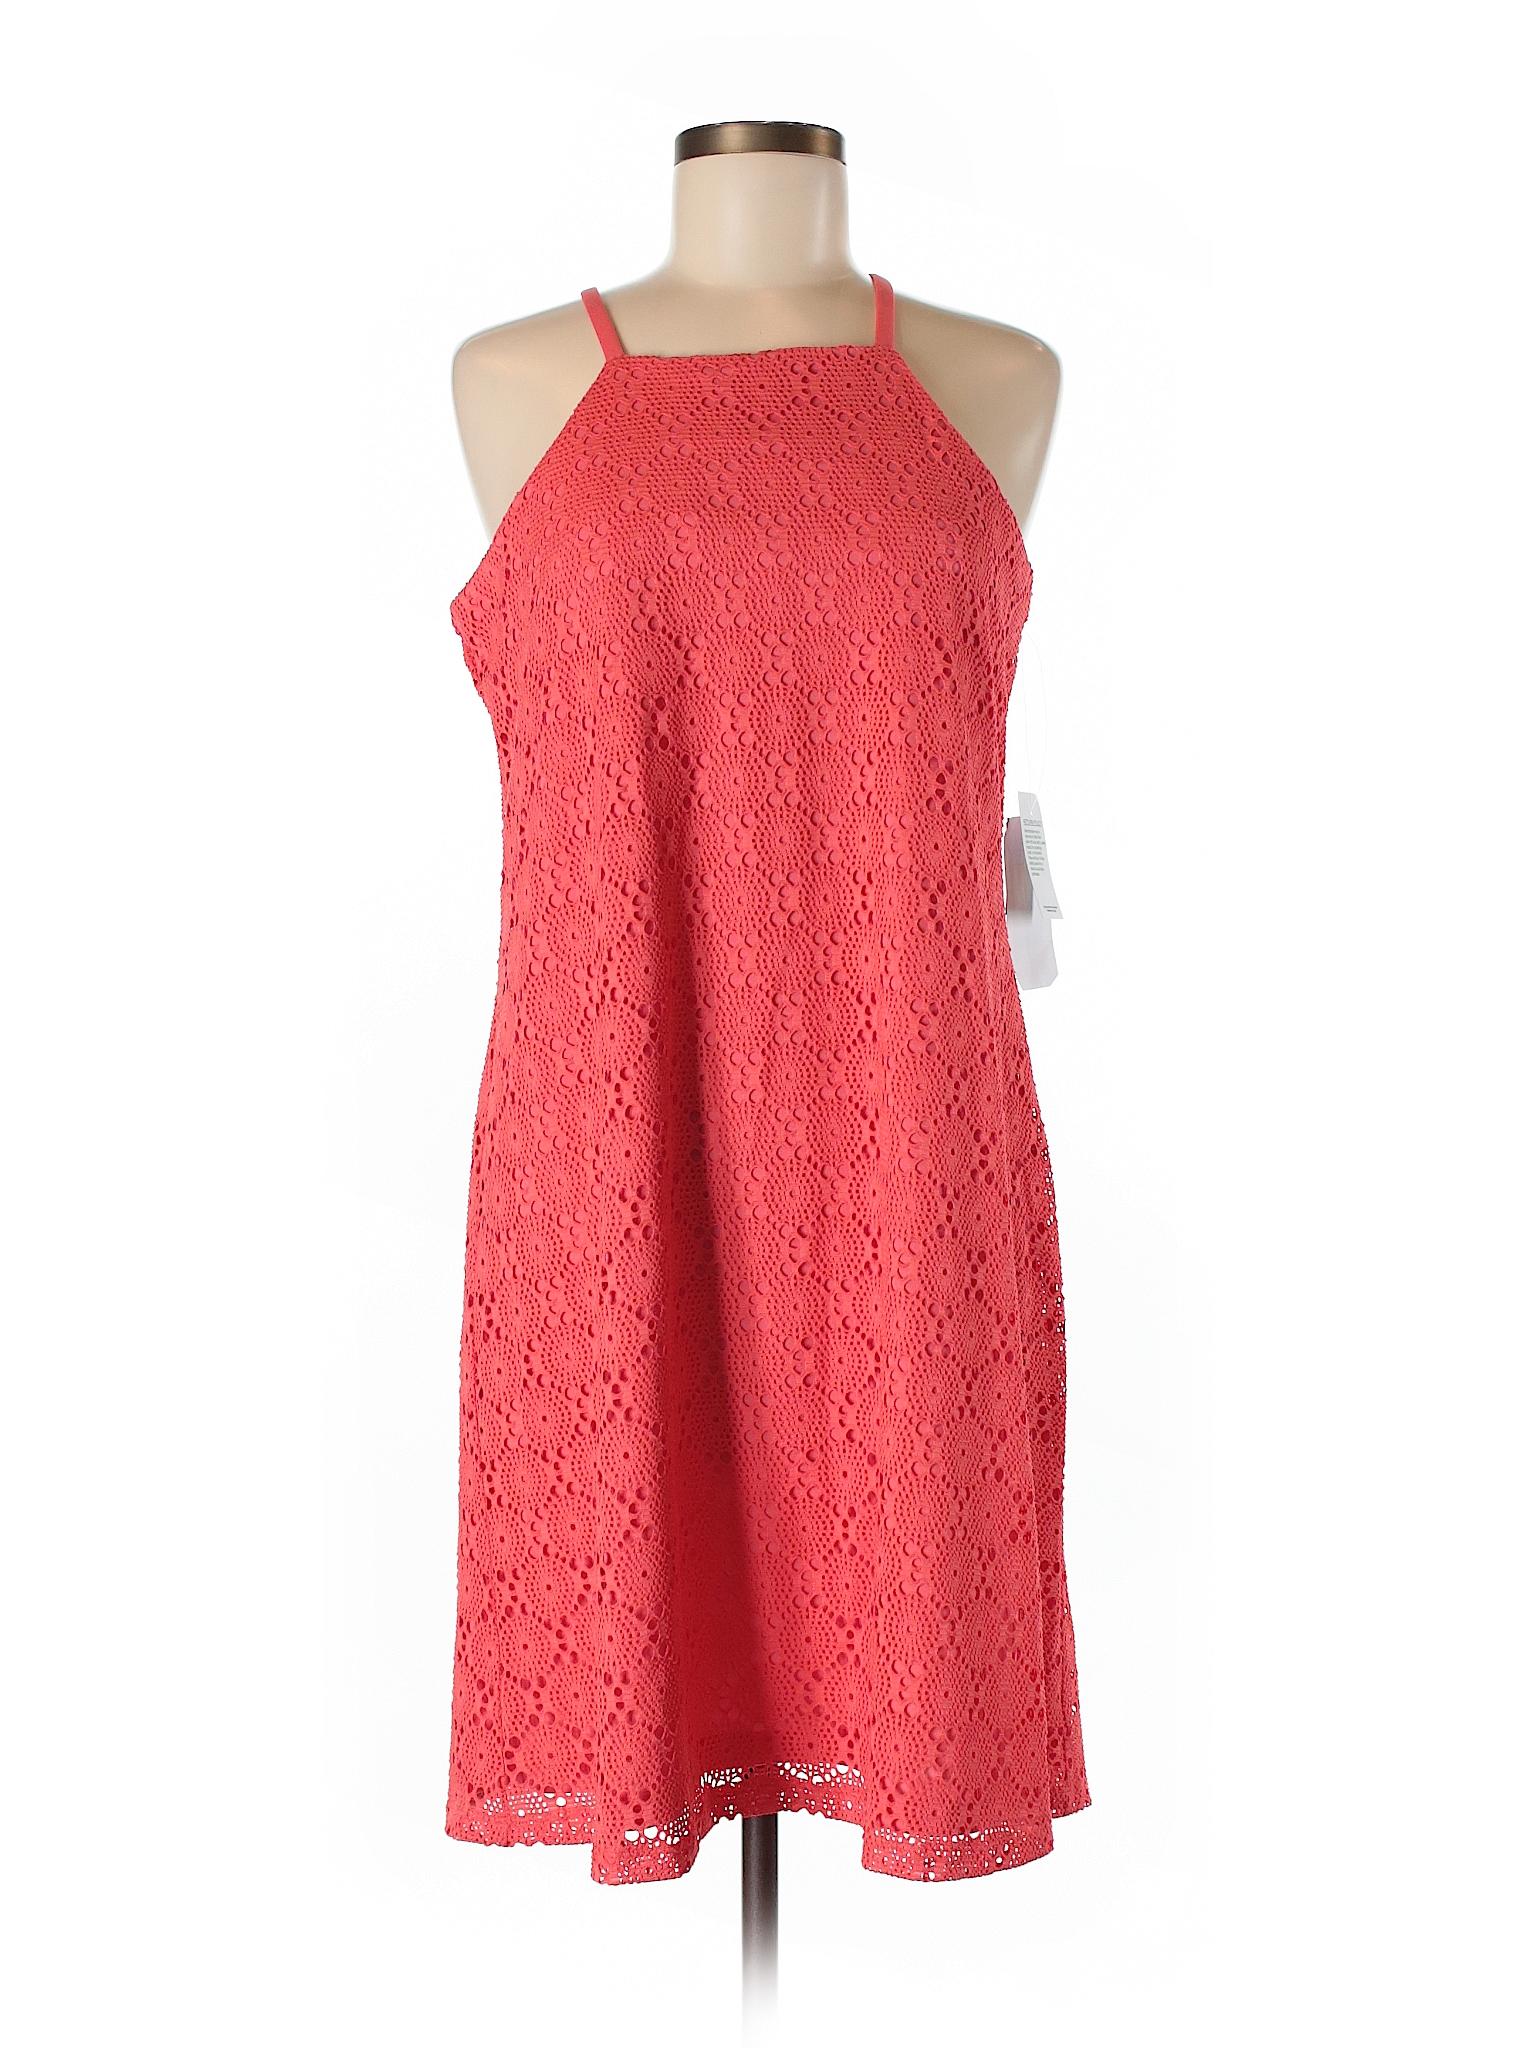 Casual Selling Selling West Nine Nine Dress qFwz7Y